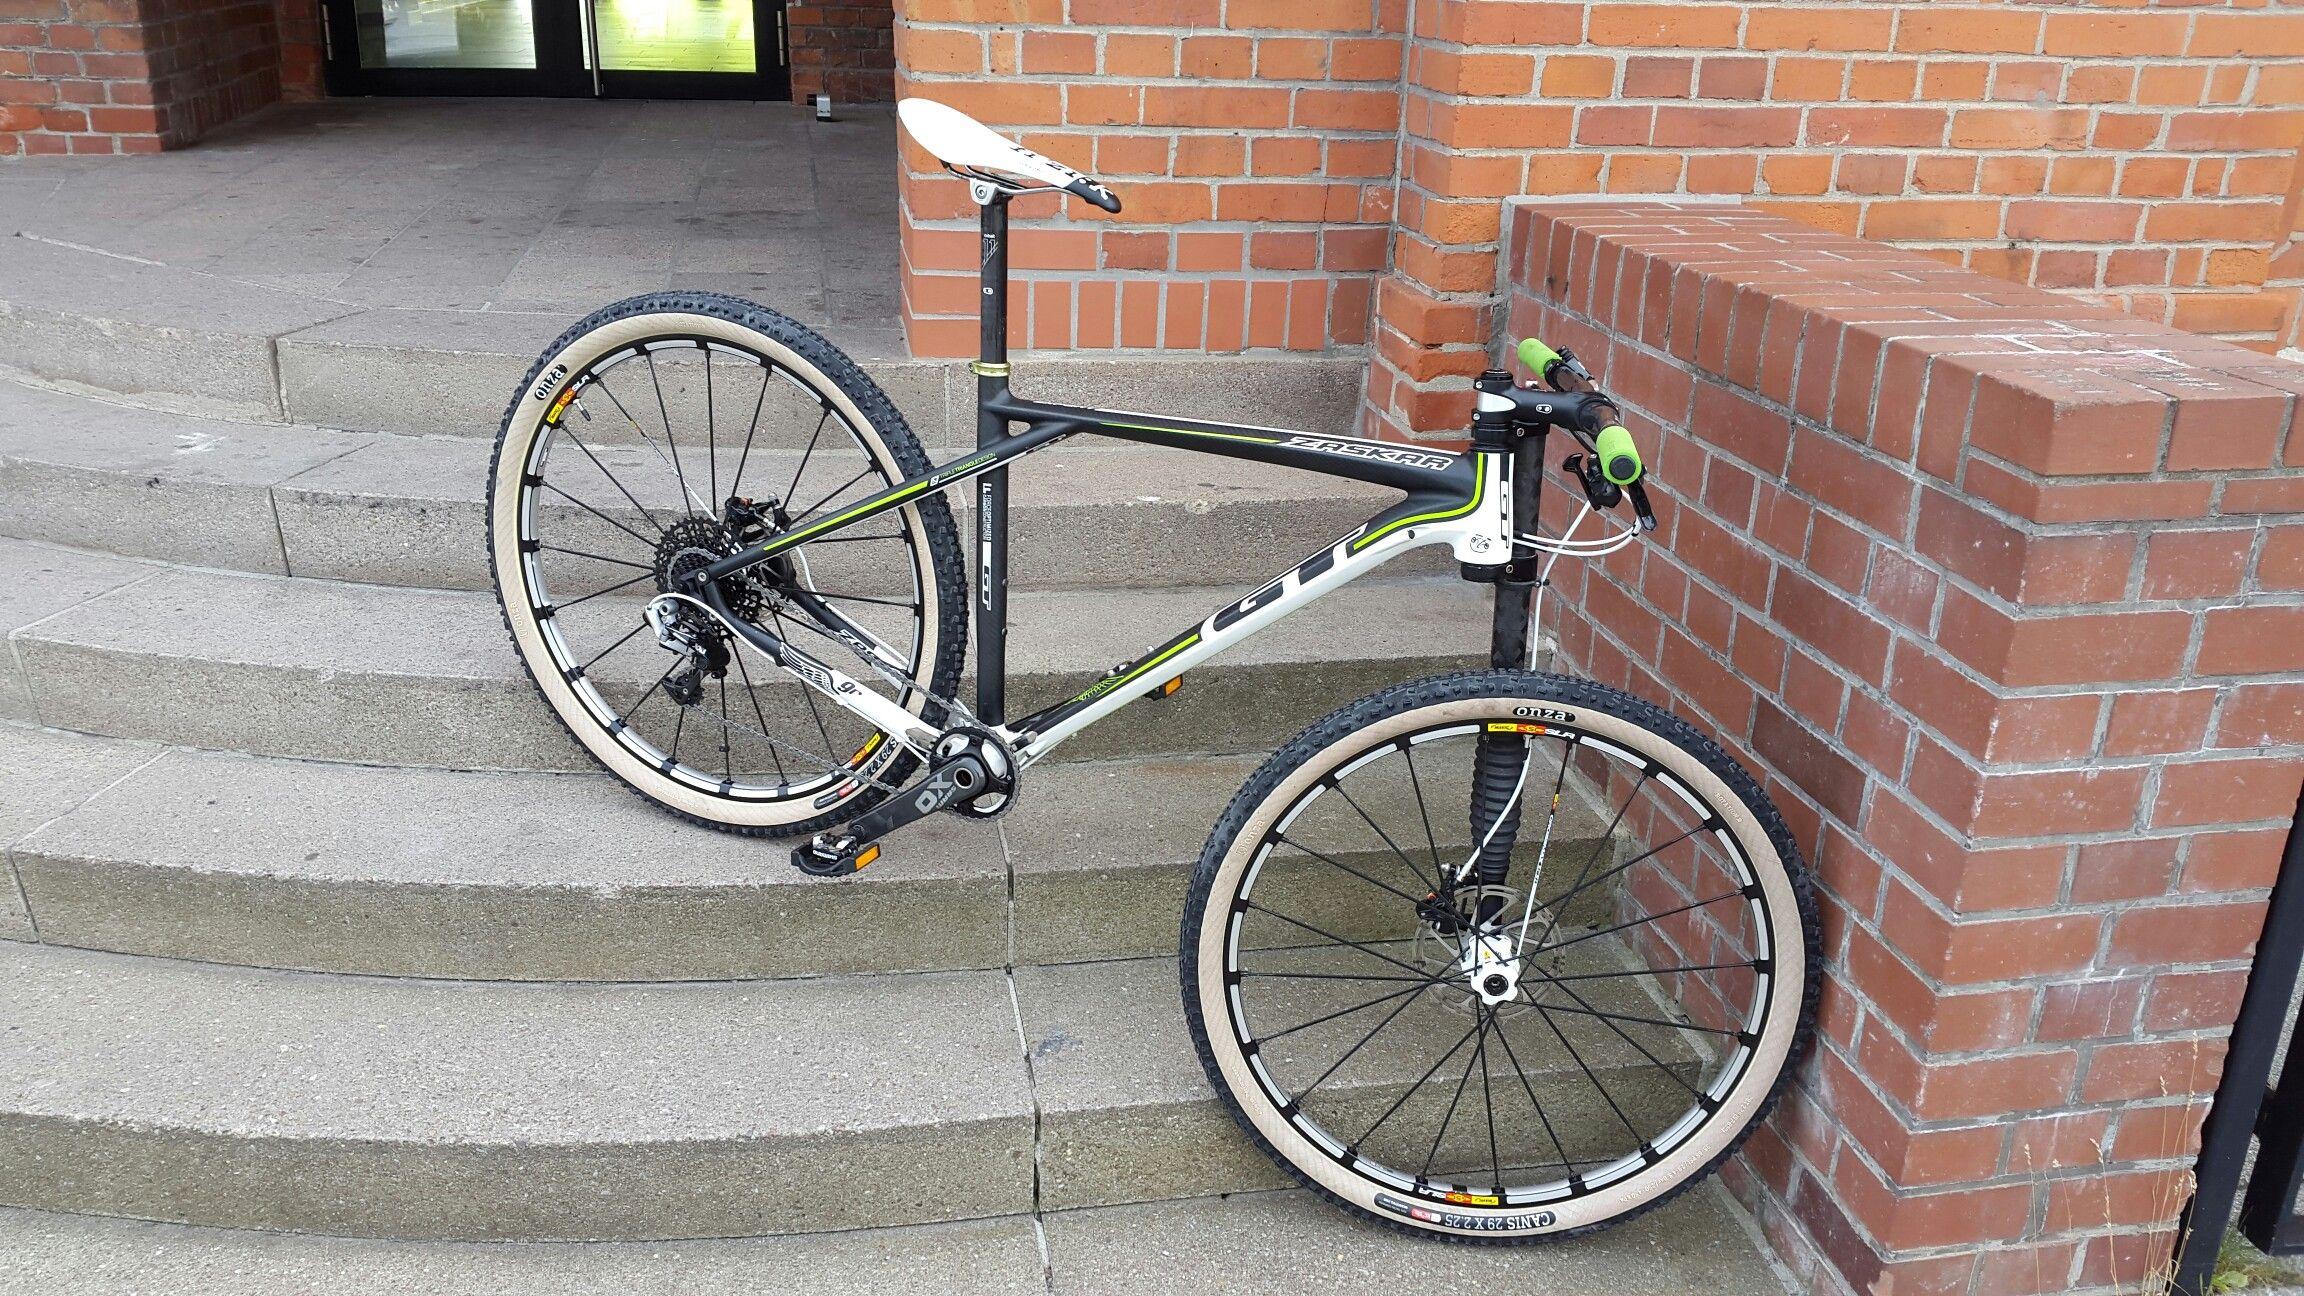 ca112b84dfd My Gt Zaskar 9r Carbon Lefty Sram 1×11 | Cycling | Bicycle, Mountain ...